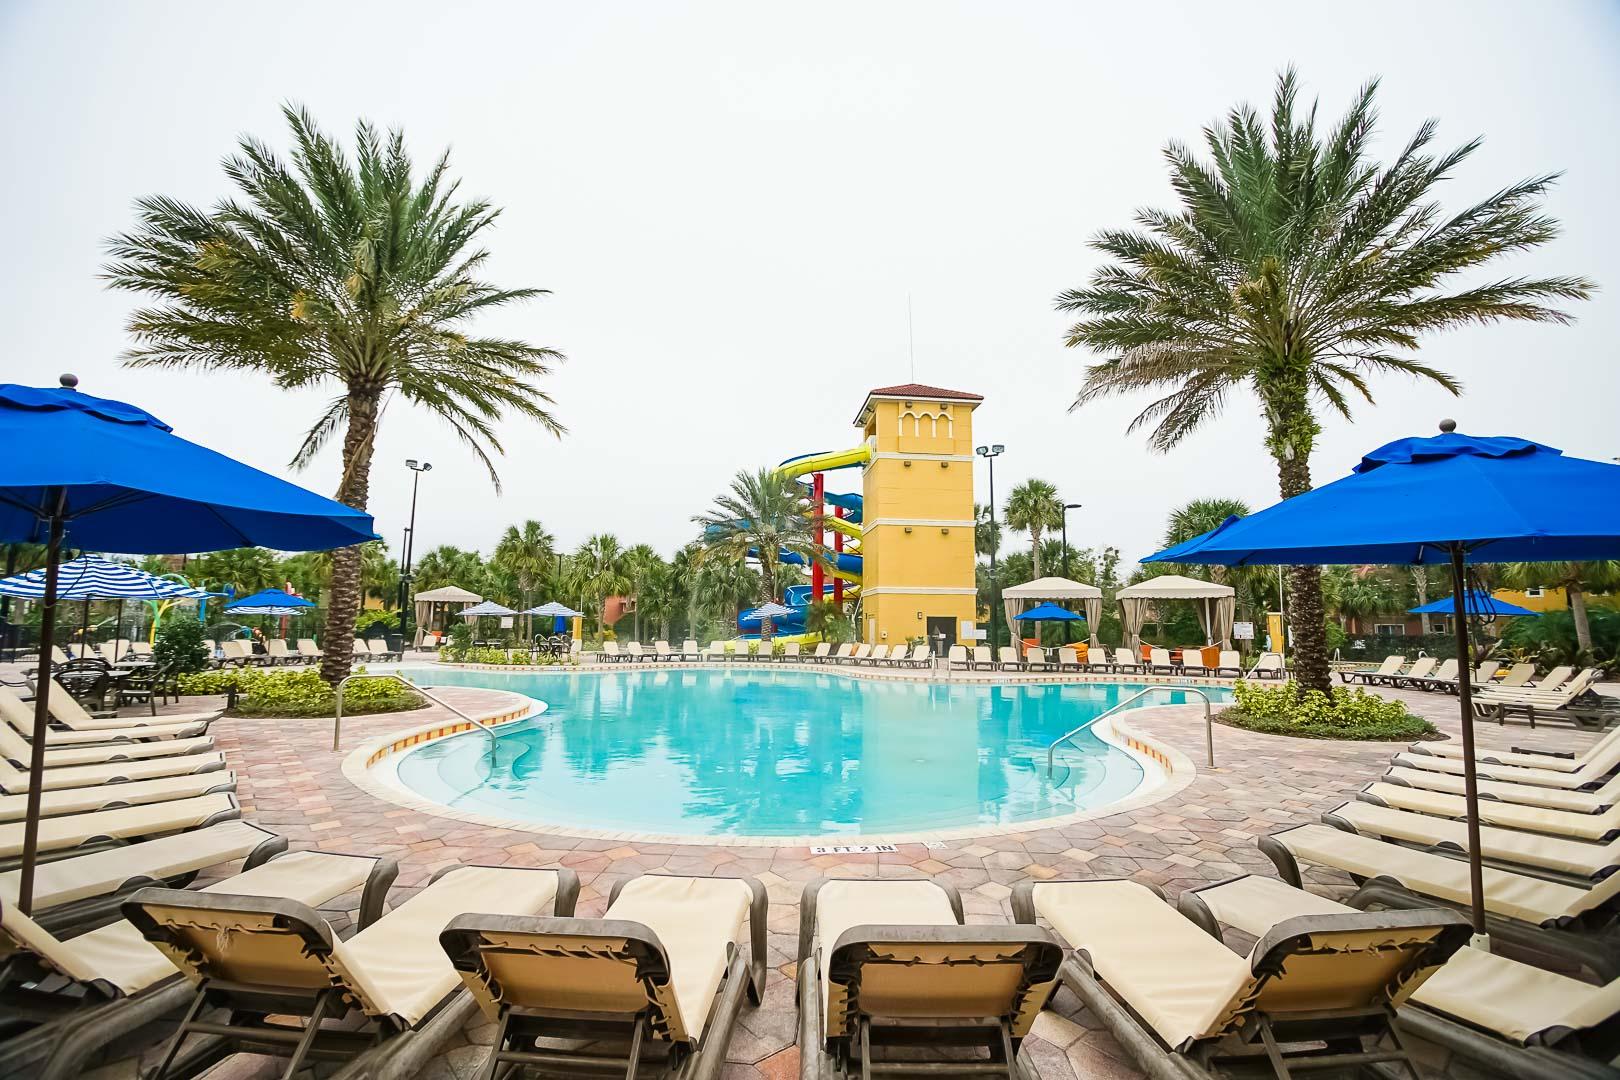 An inviting outdoor swimming pool at VRI's Fantasy World Resort in Florida.